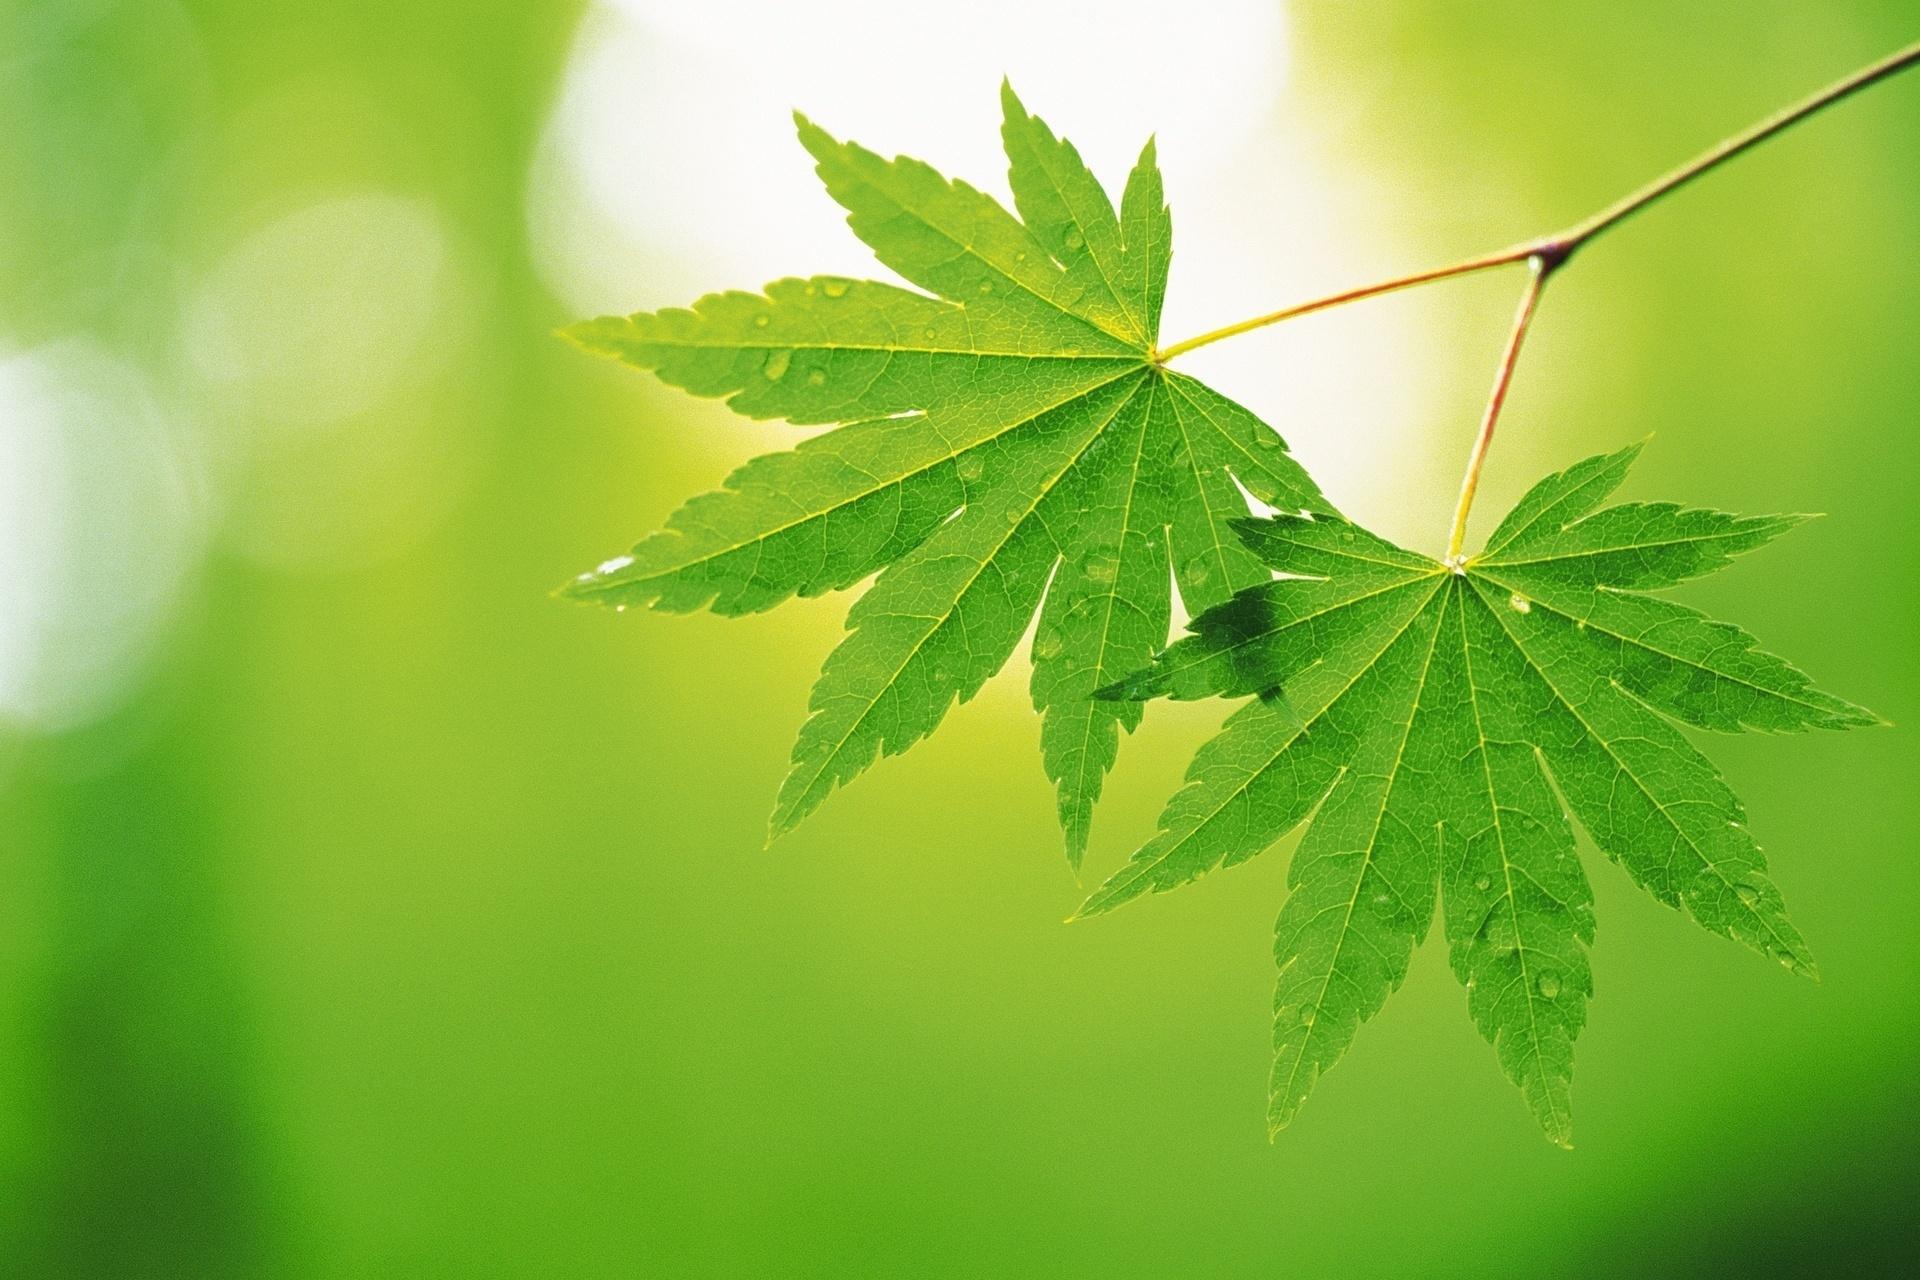 Green Leaf Wallpaper HD  WallpaperSafari